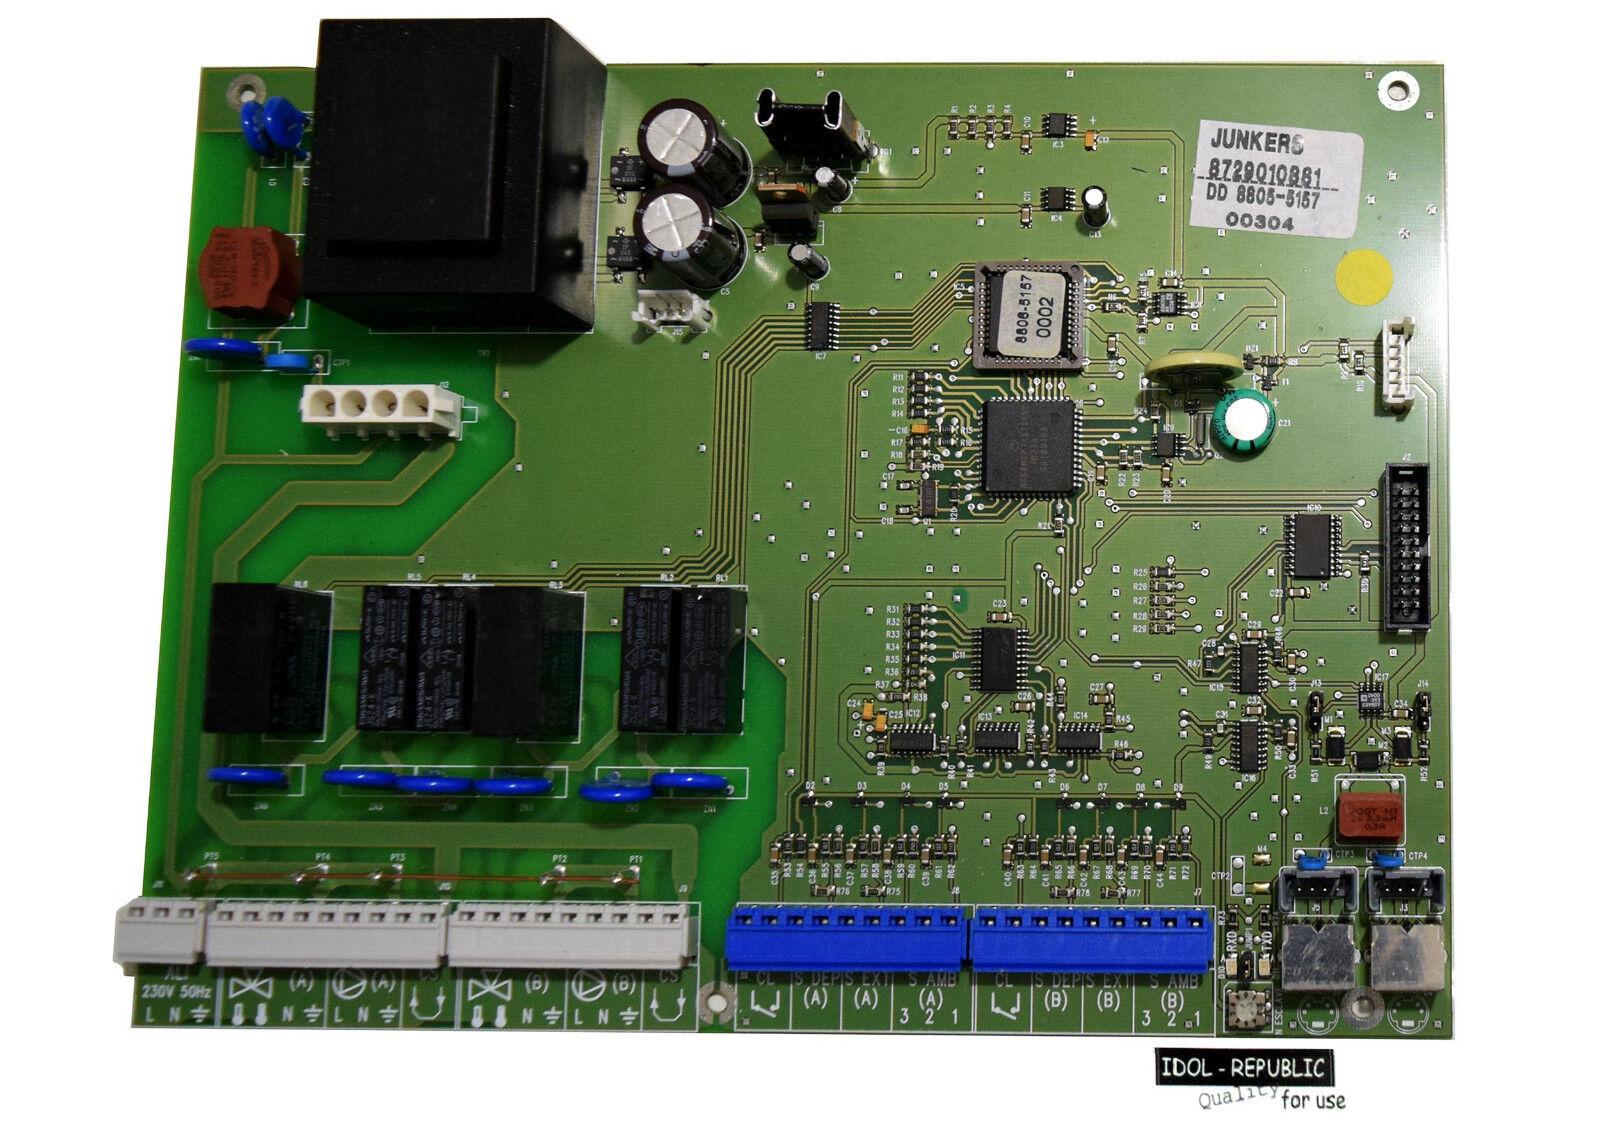 Junkers - Leiterplatte für TAC-Plus 2 - 8729010881 - DD 8805-5157 - TAC Plus 2